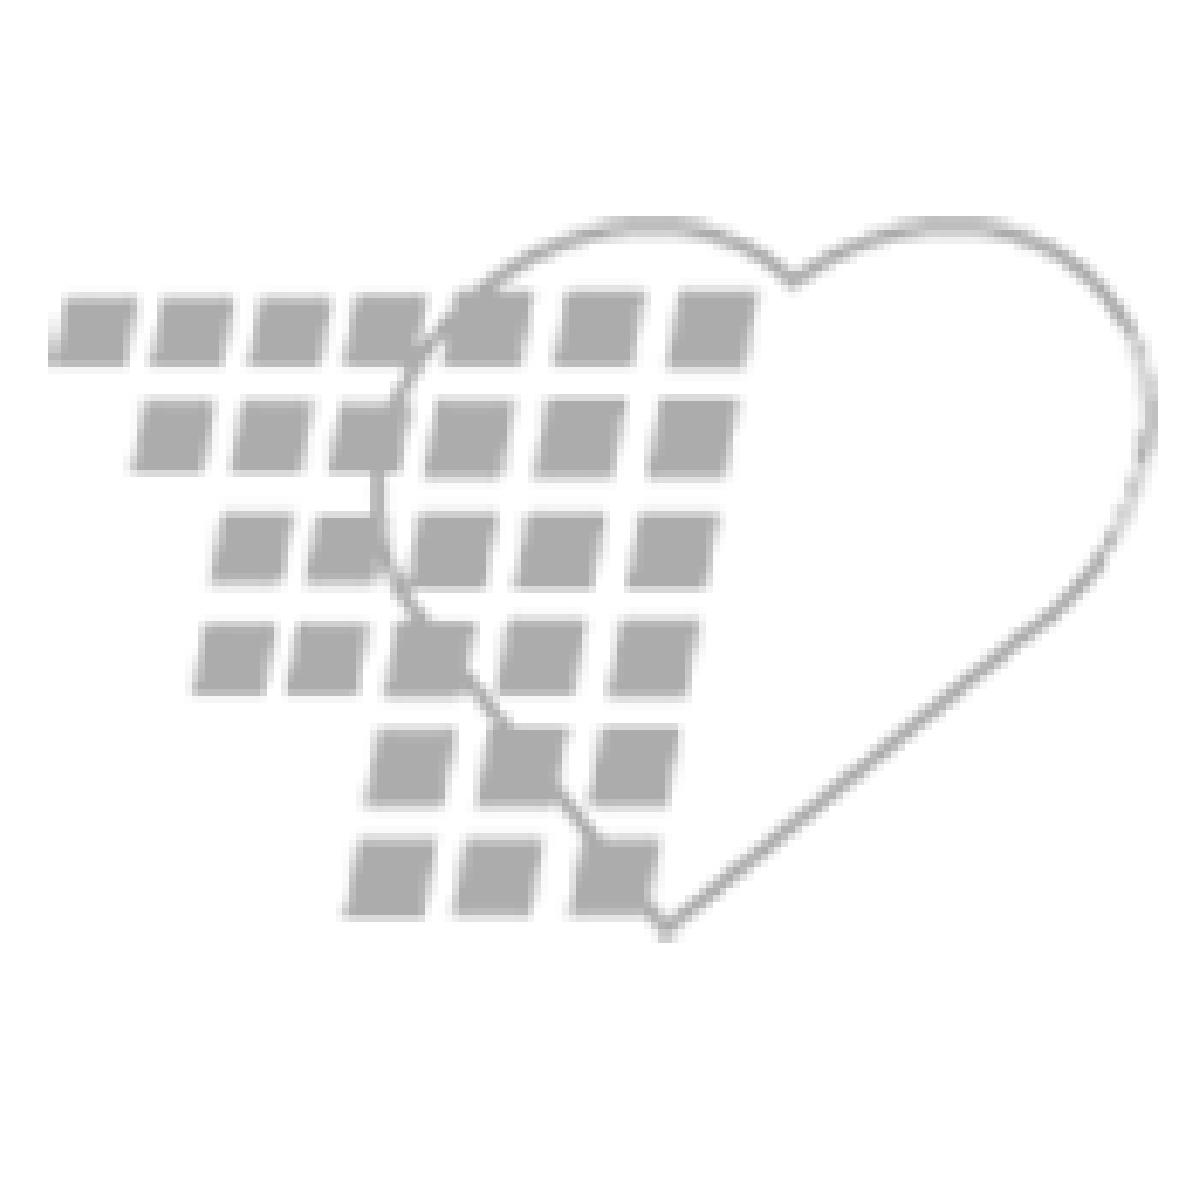 05-02-1147 - White Petrolatum Jar - 15 oz.